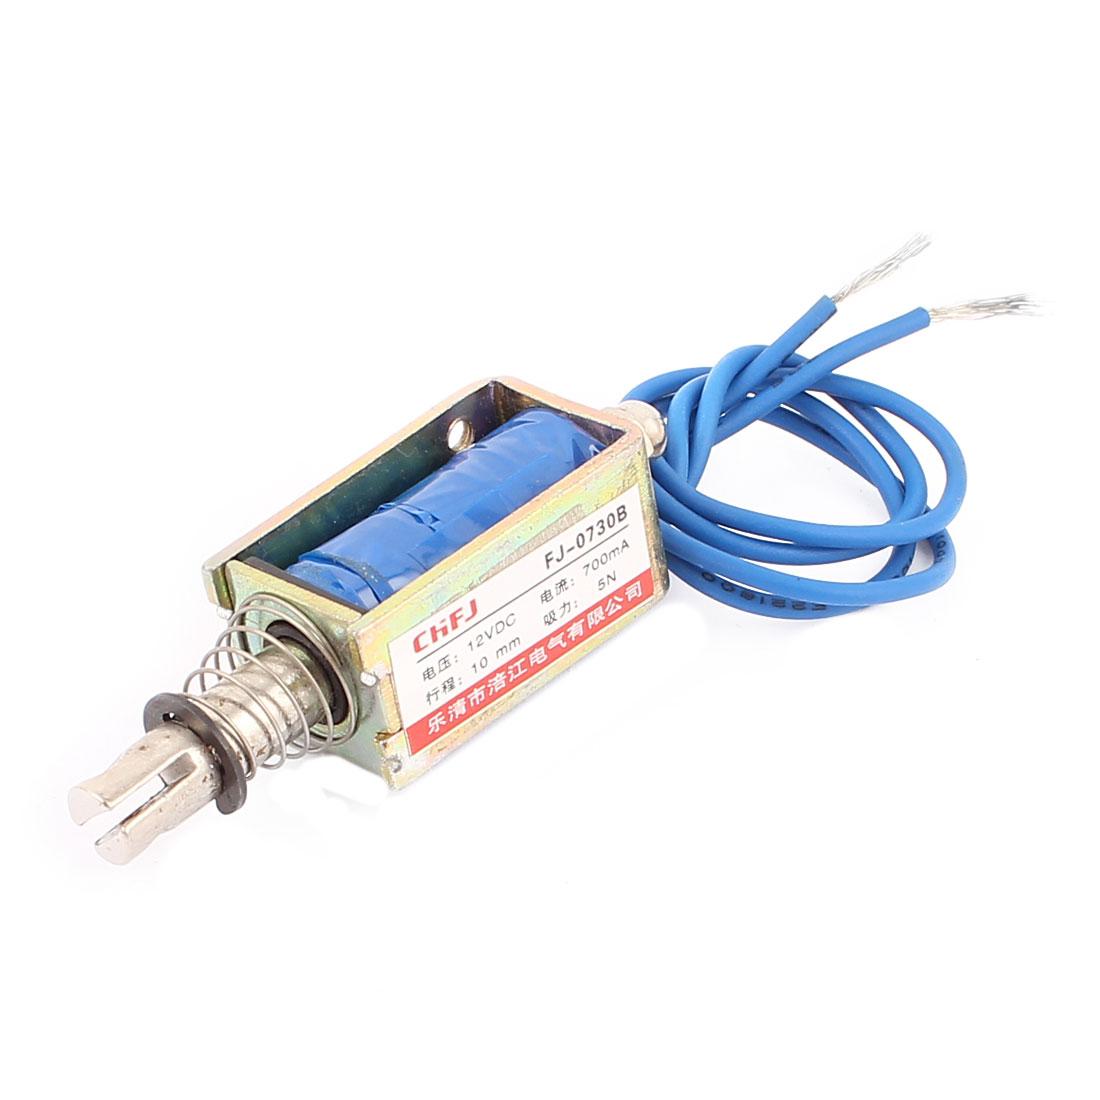 DC12V 700mA 10mm 5N Spring Load Push Pull Actuator Electromagnet Solenoid FJ-0730B